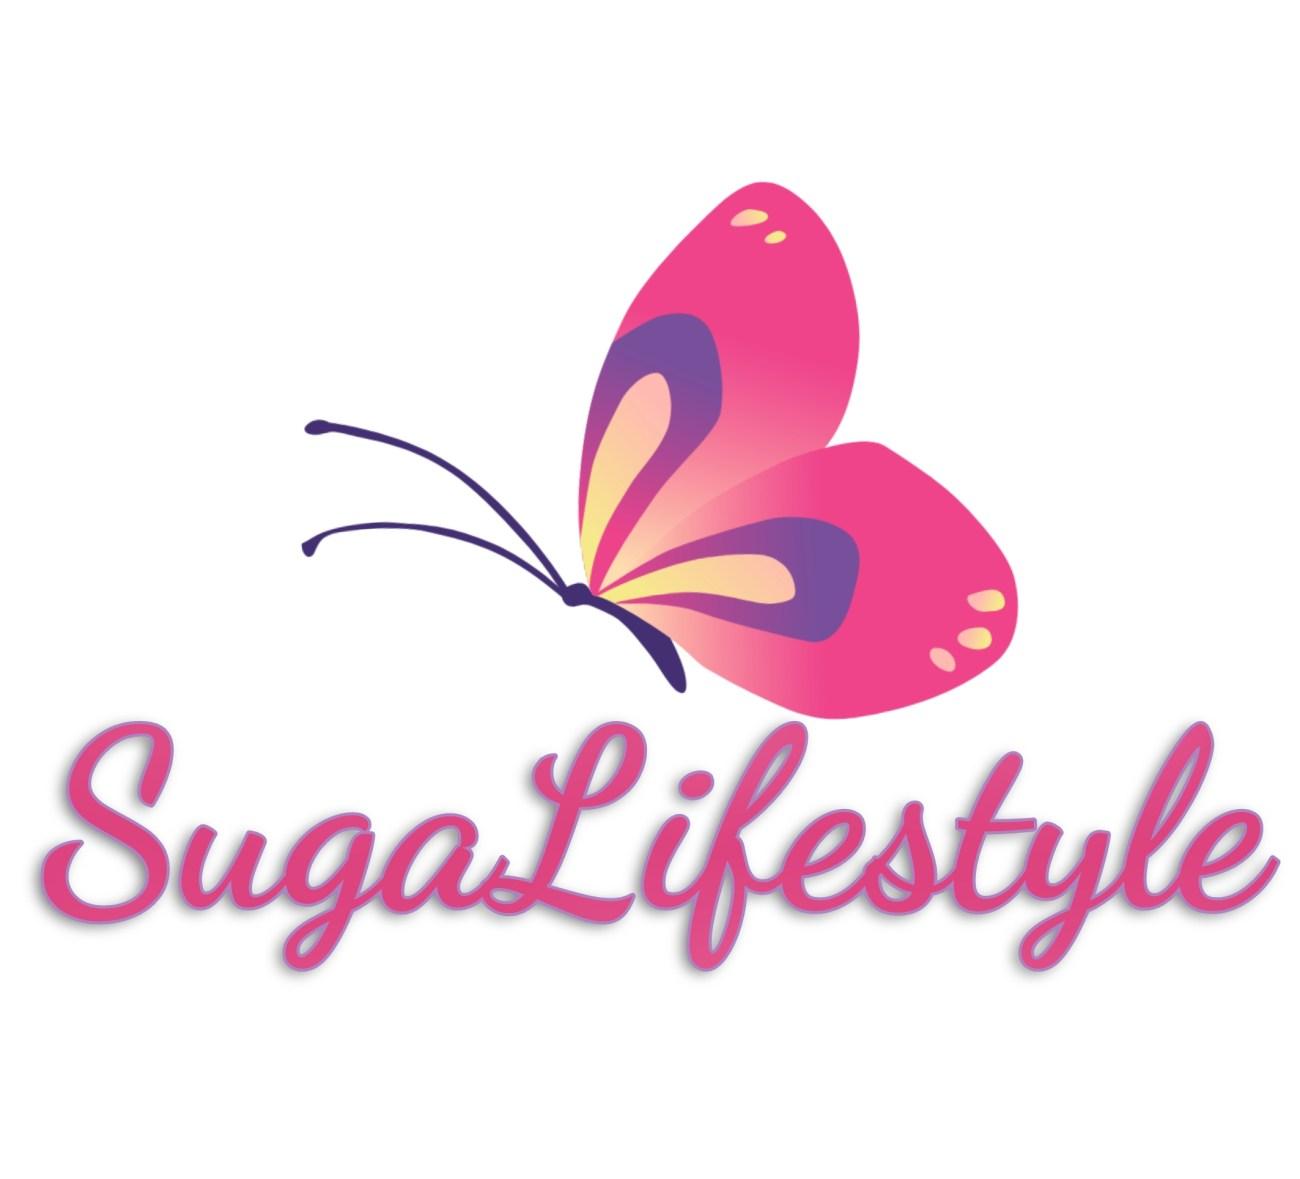 Main-Suga Lifestyle logo